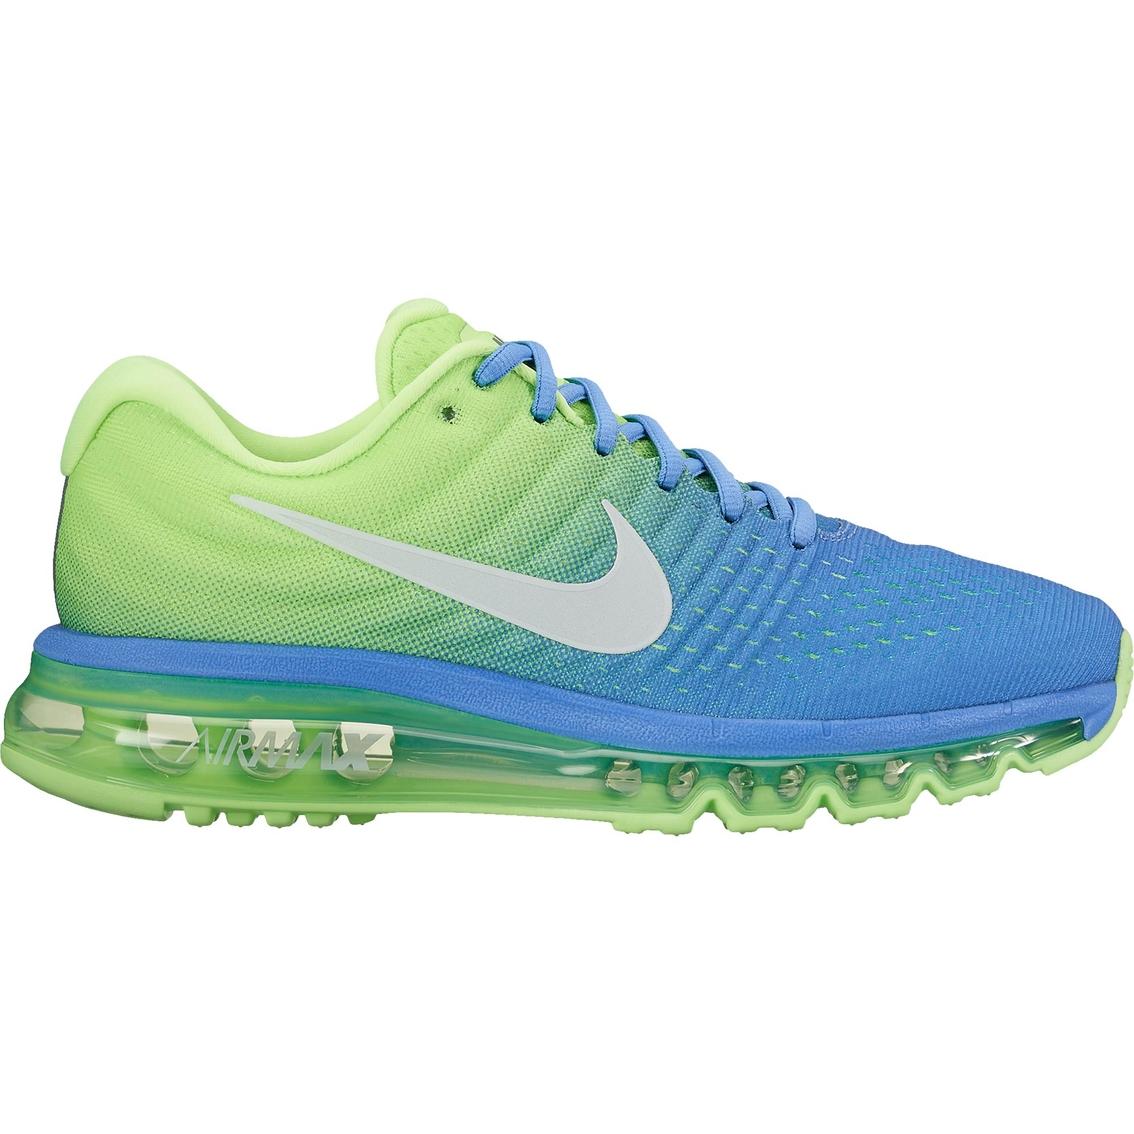 Nike Women's Air Max 2017 Running Shoes